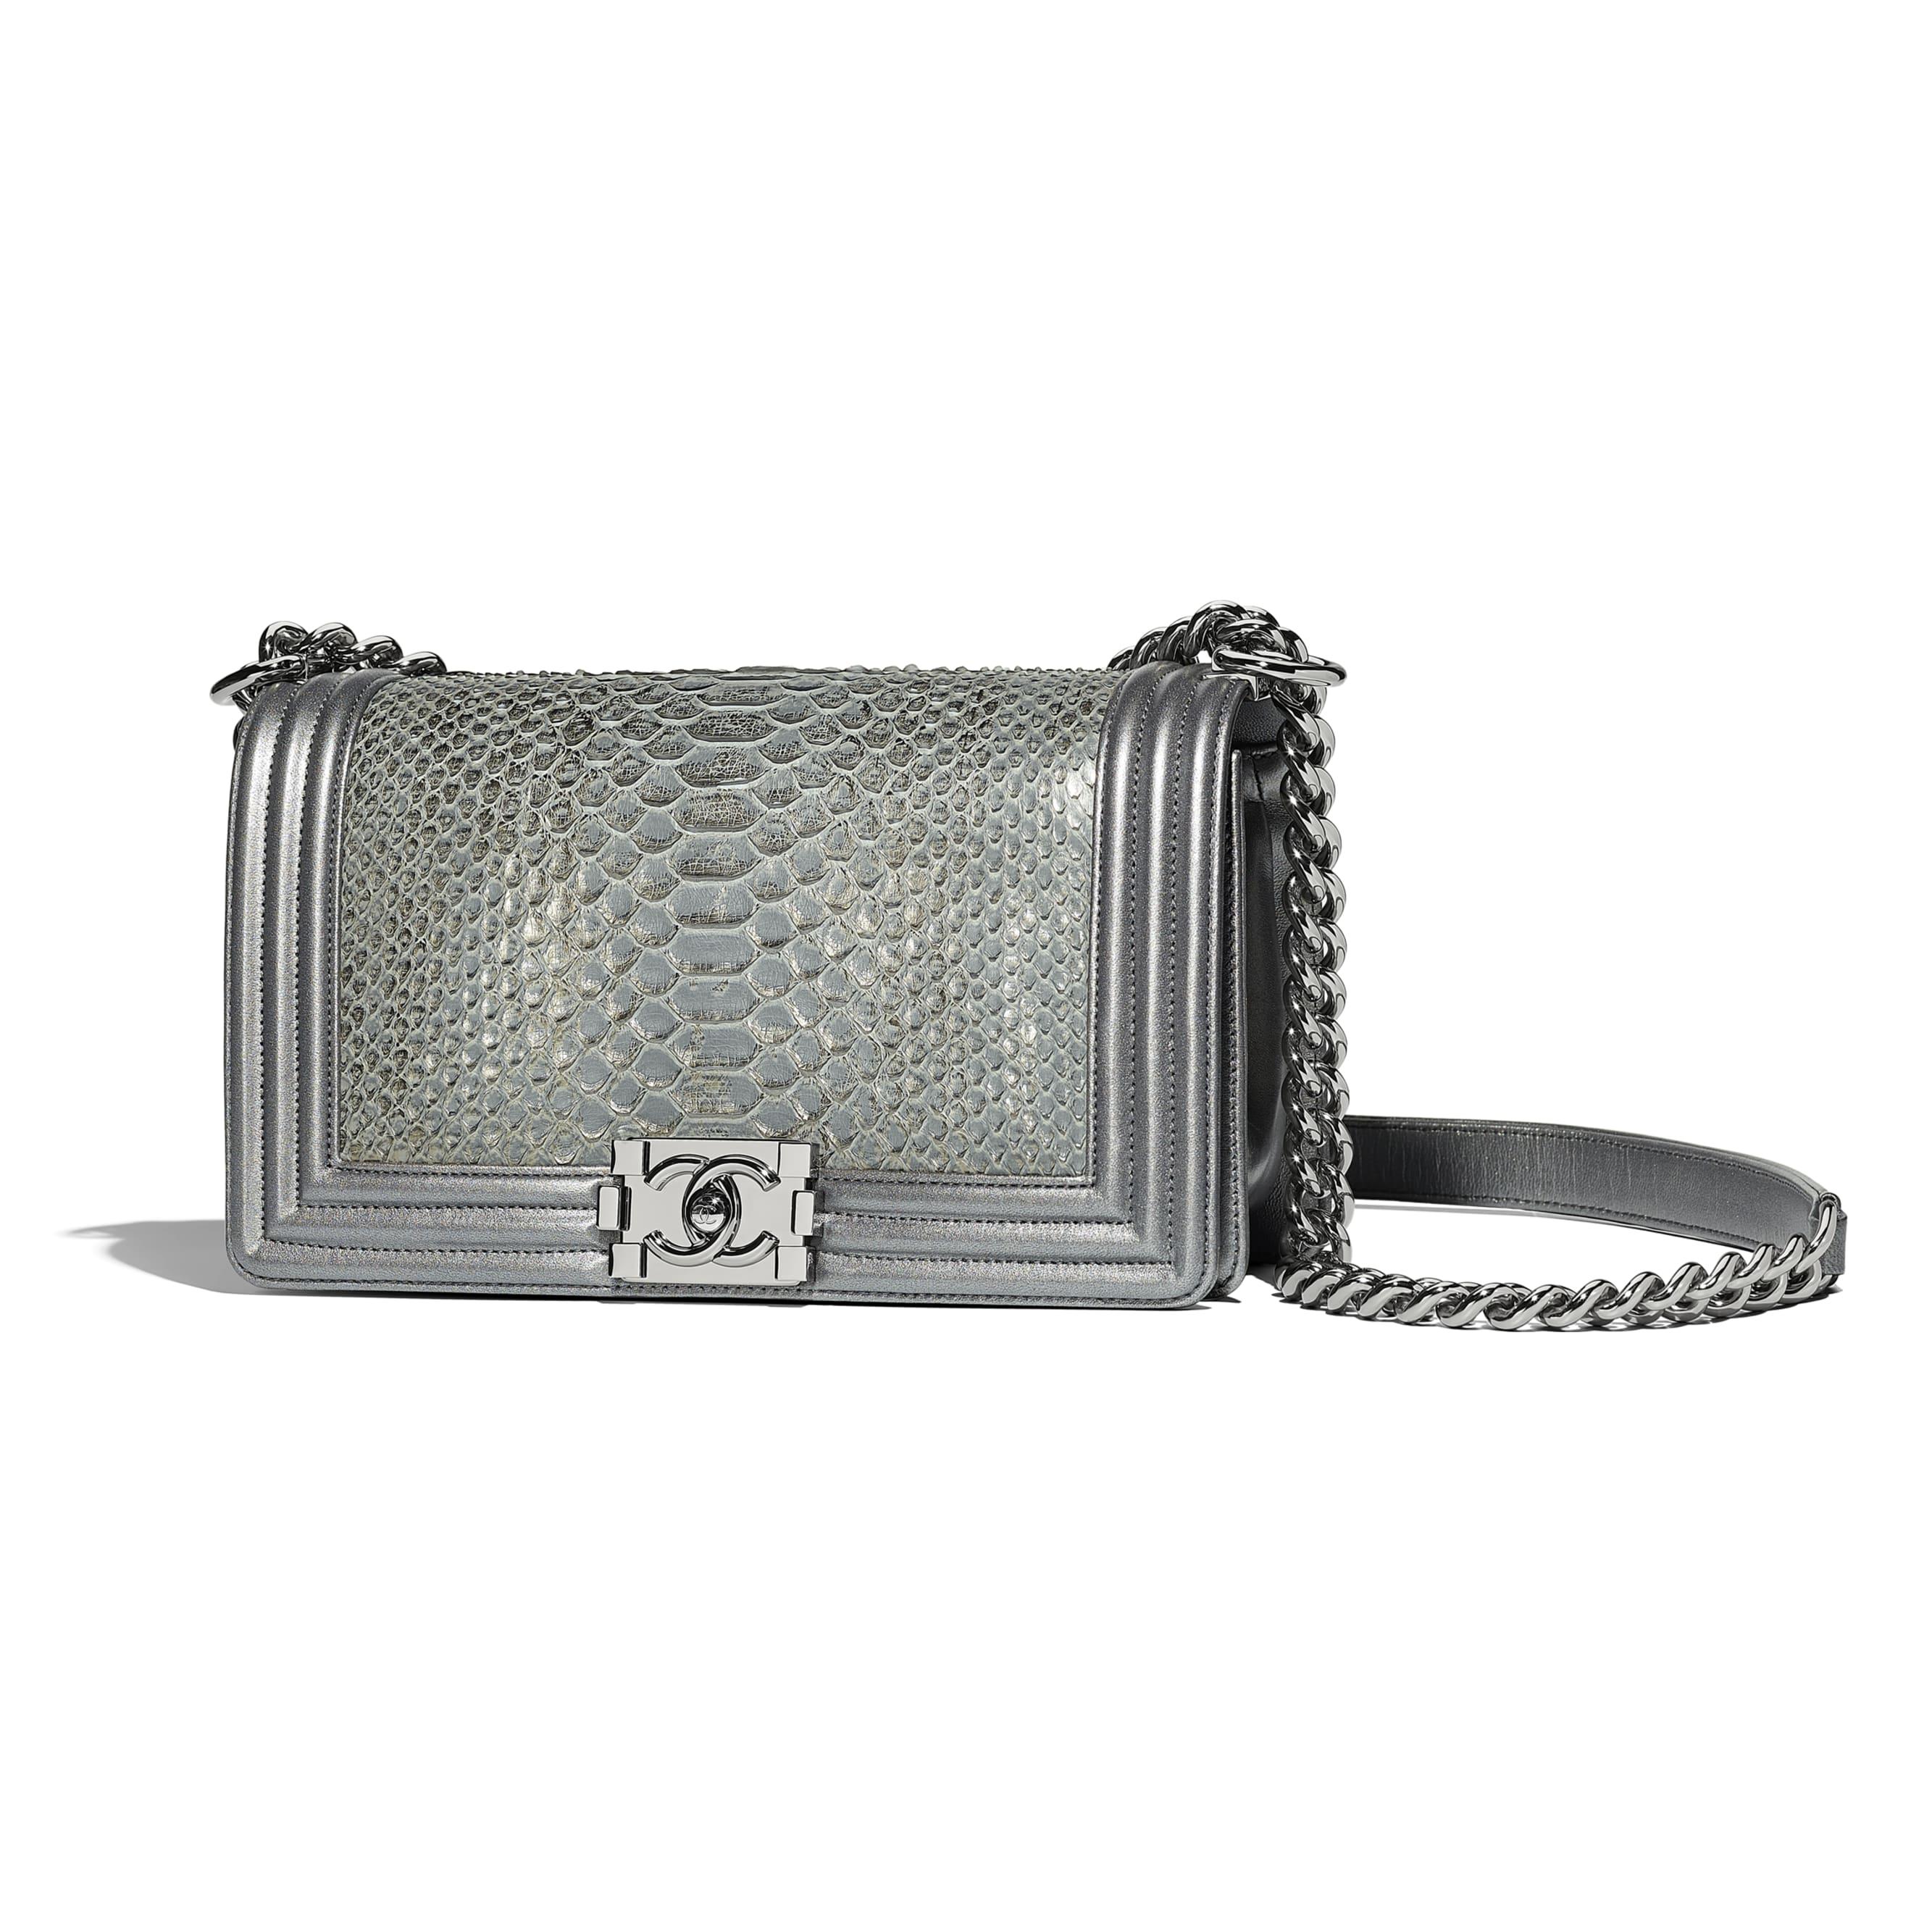 BOY CHANEL Handbag - Silver - Python, Metallic Lambskin & Ruthenium-Finish Metal - Default view - see standard sized version